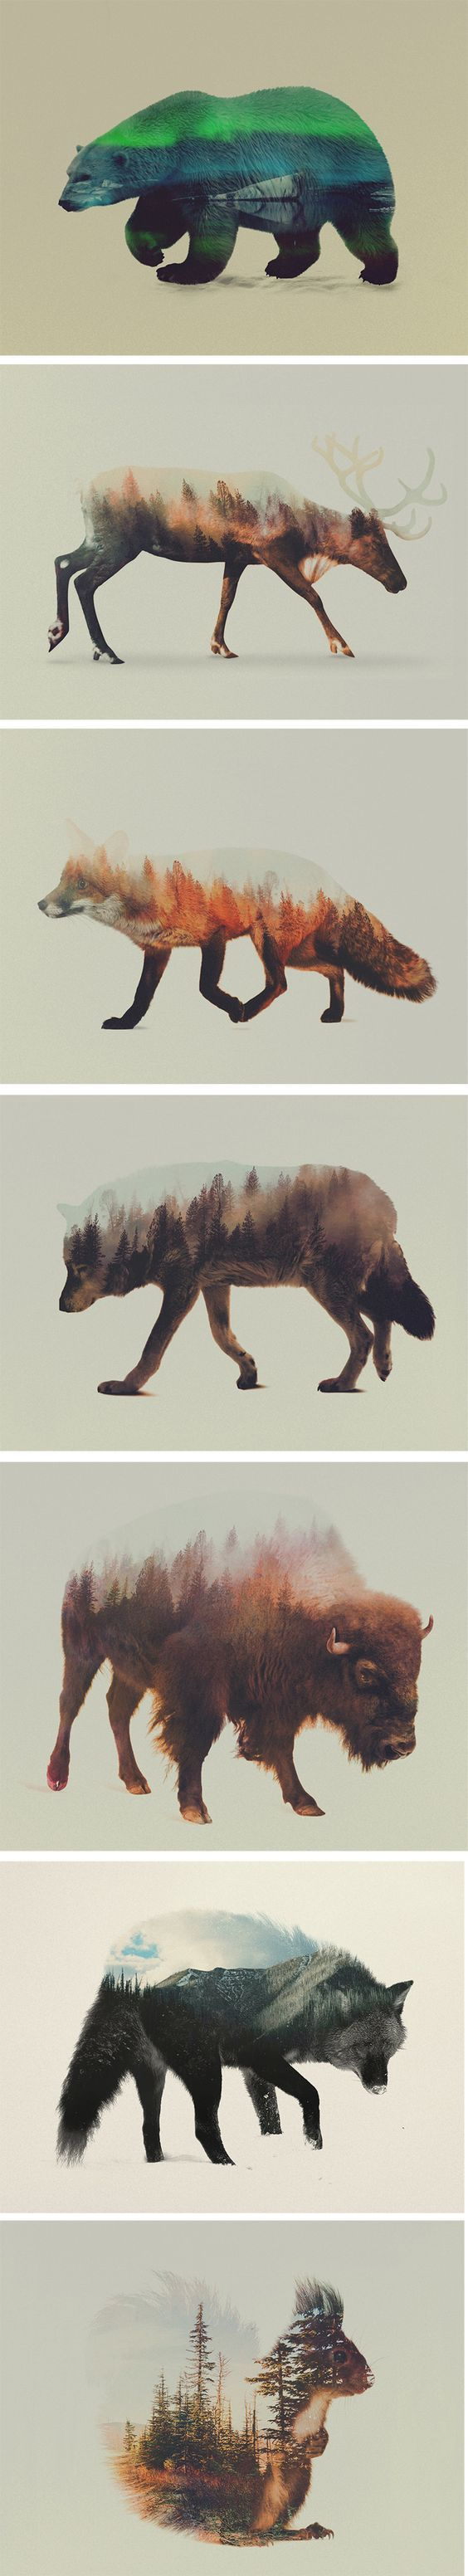 Norwegian visual artist Andreas Lie: